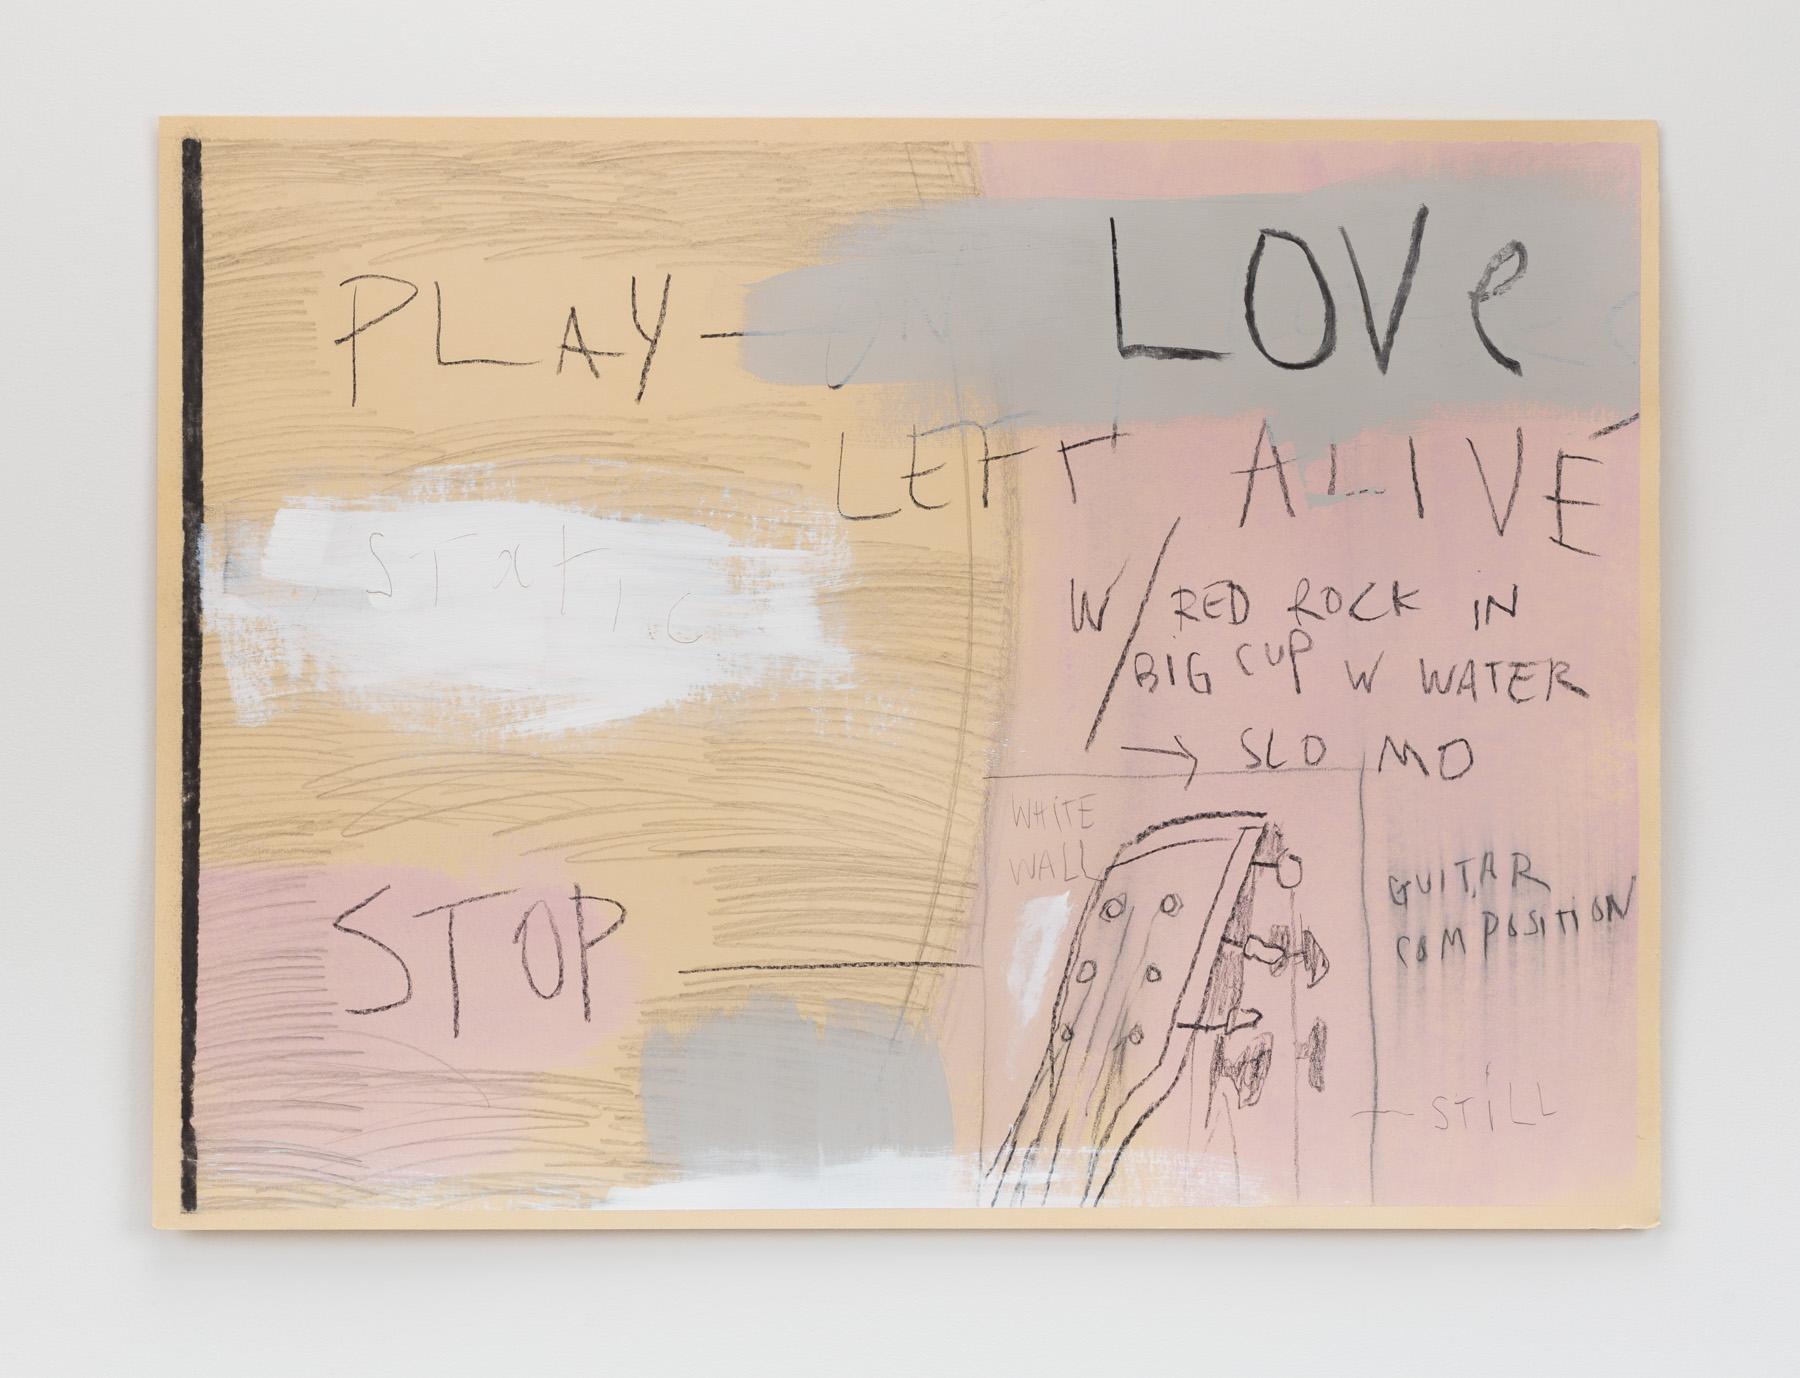 Play Love